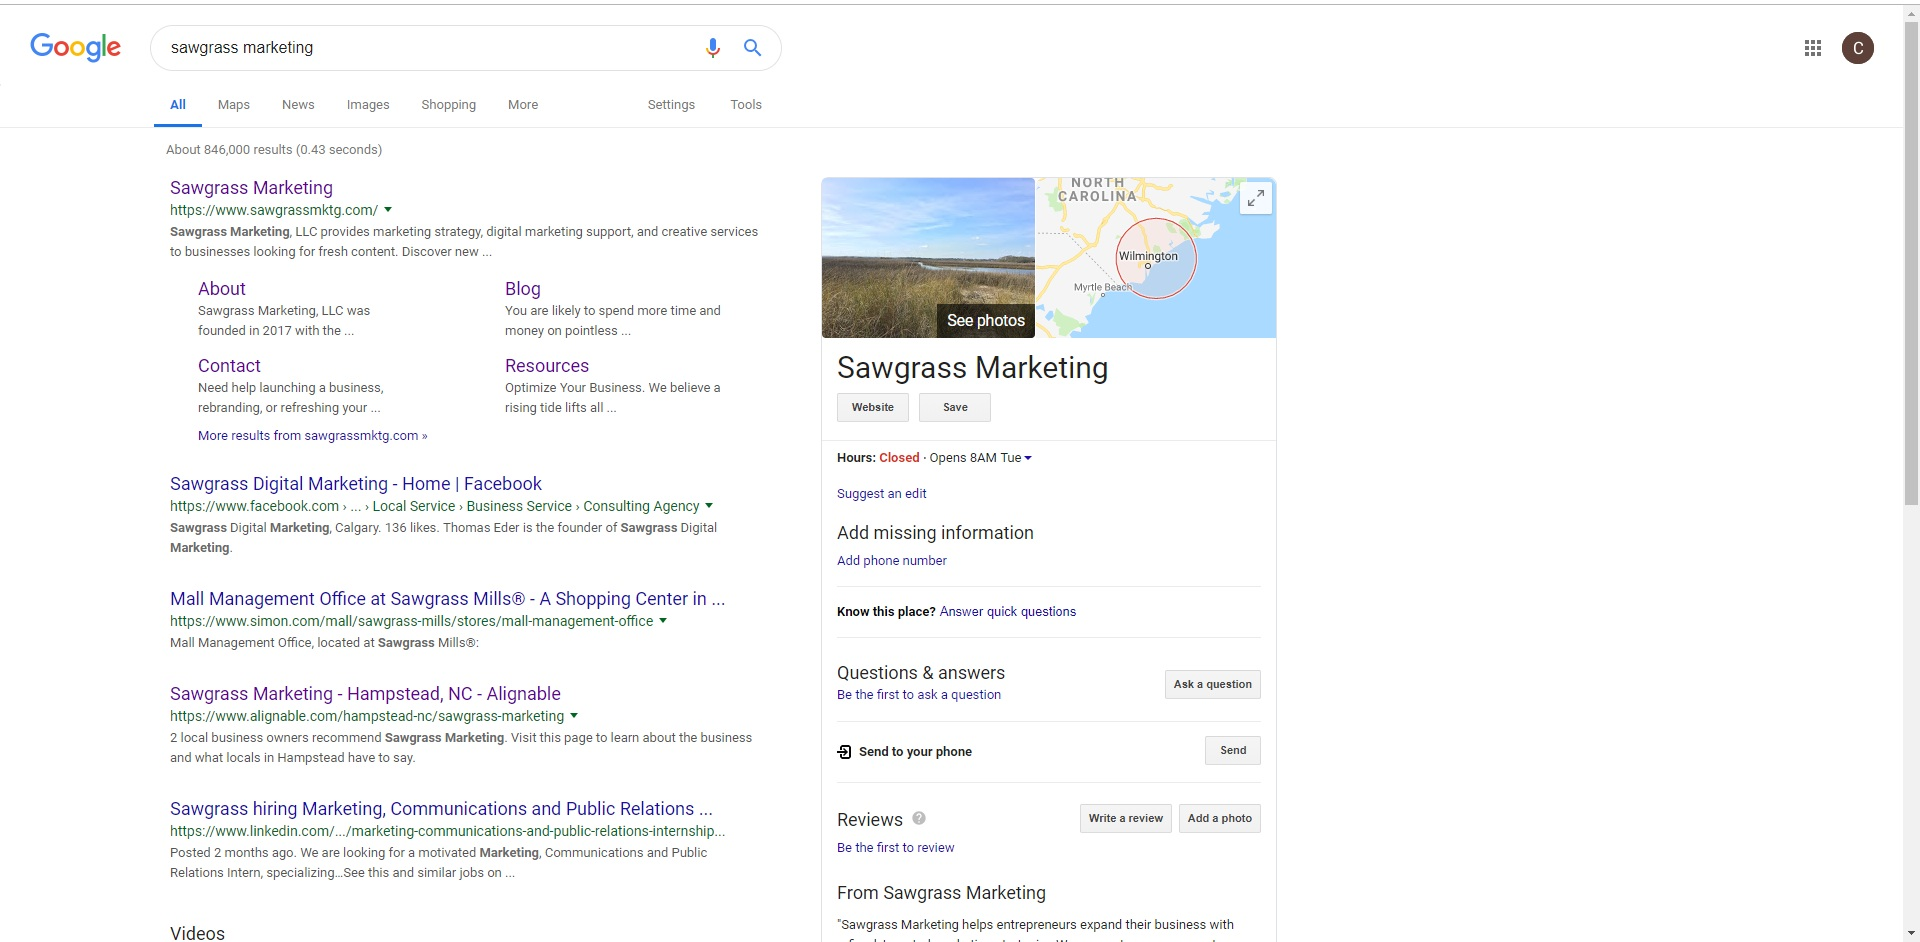 Sawgrass Marketing Google Business